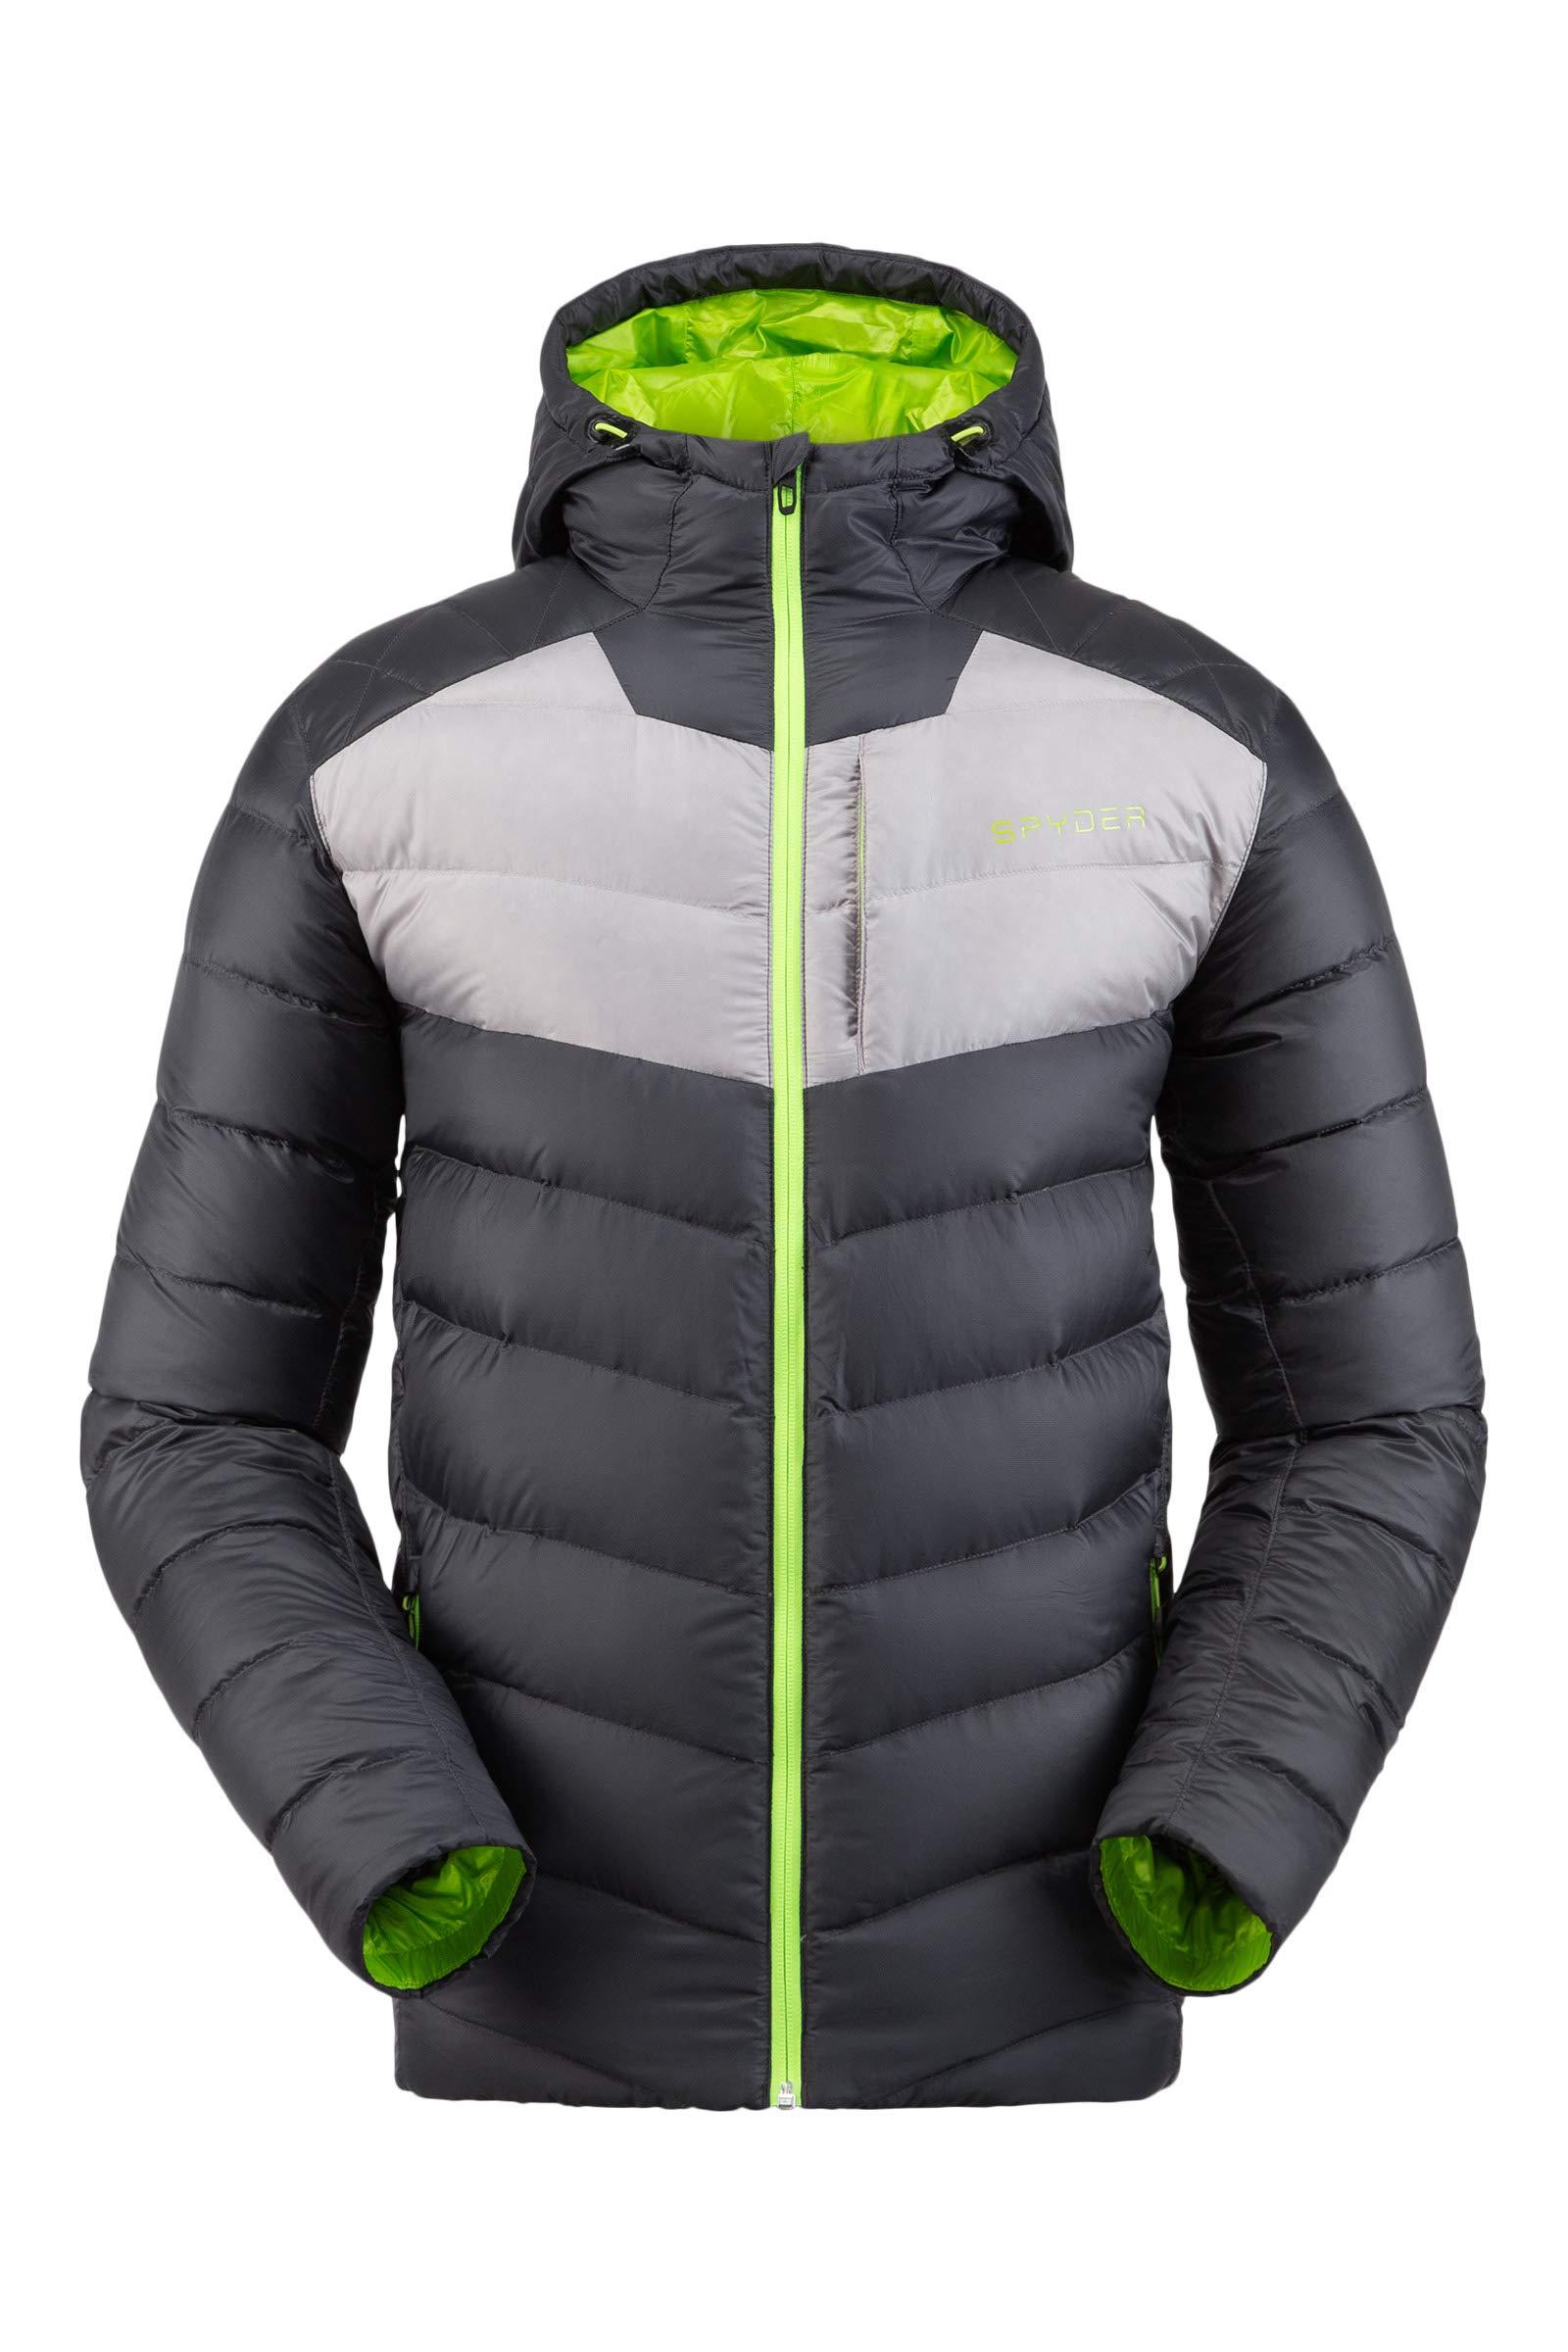 Spyder Women/'s Timeless Hoodie Down Jacket Paneled Puffy Lightweight Hooded Full Zip